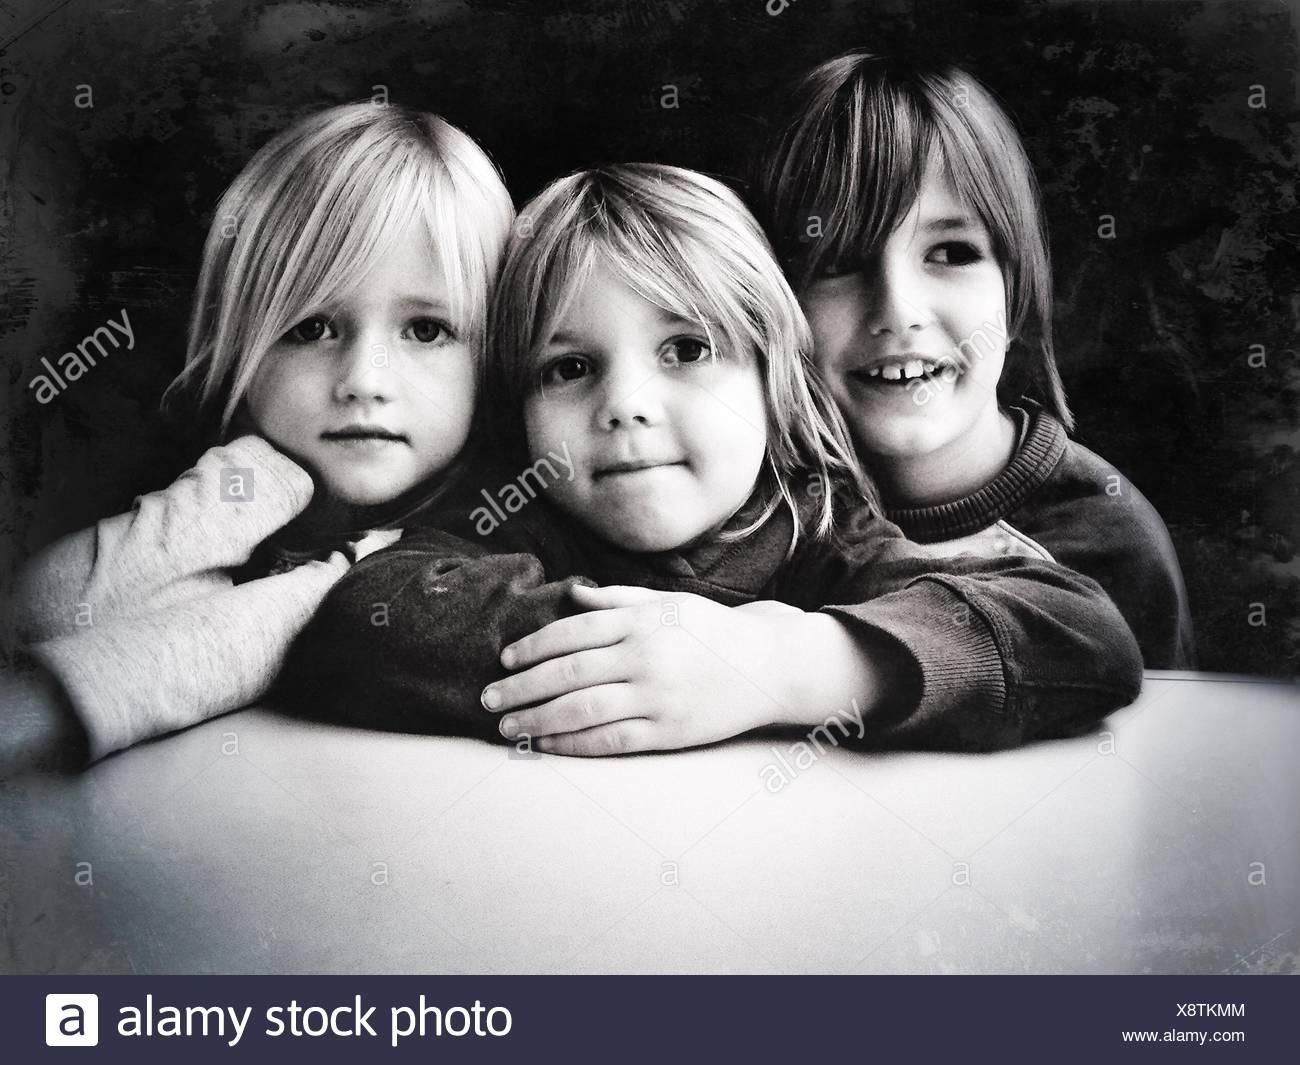 Portrait Of Siblings - Stock Image